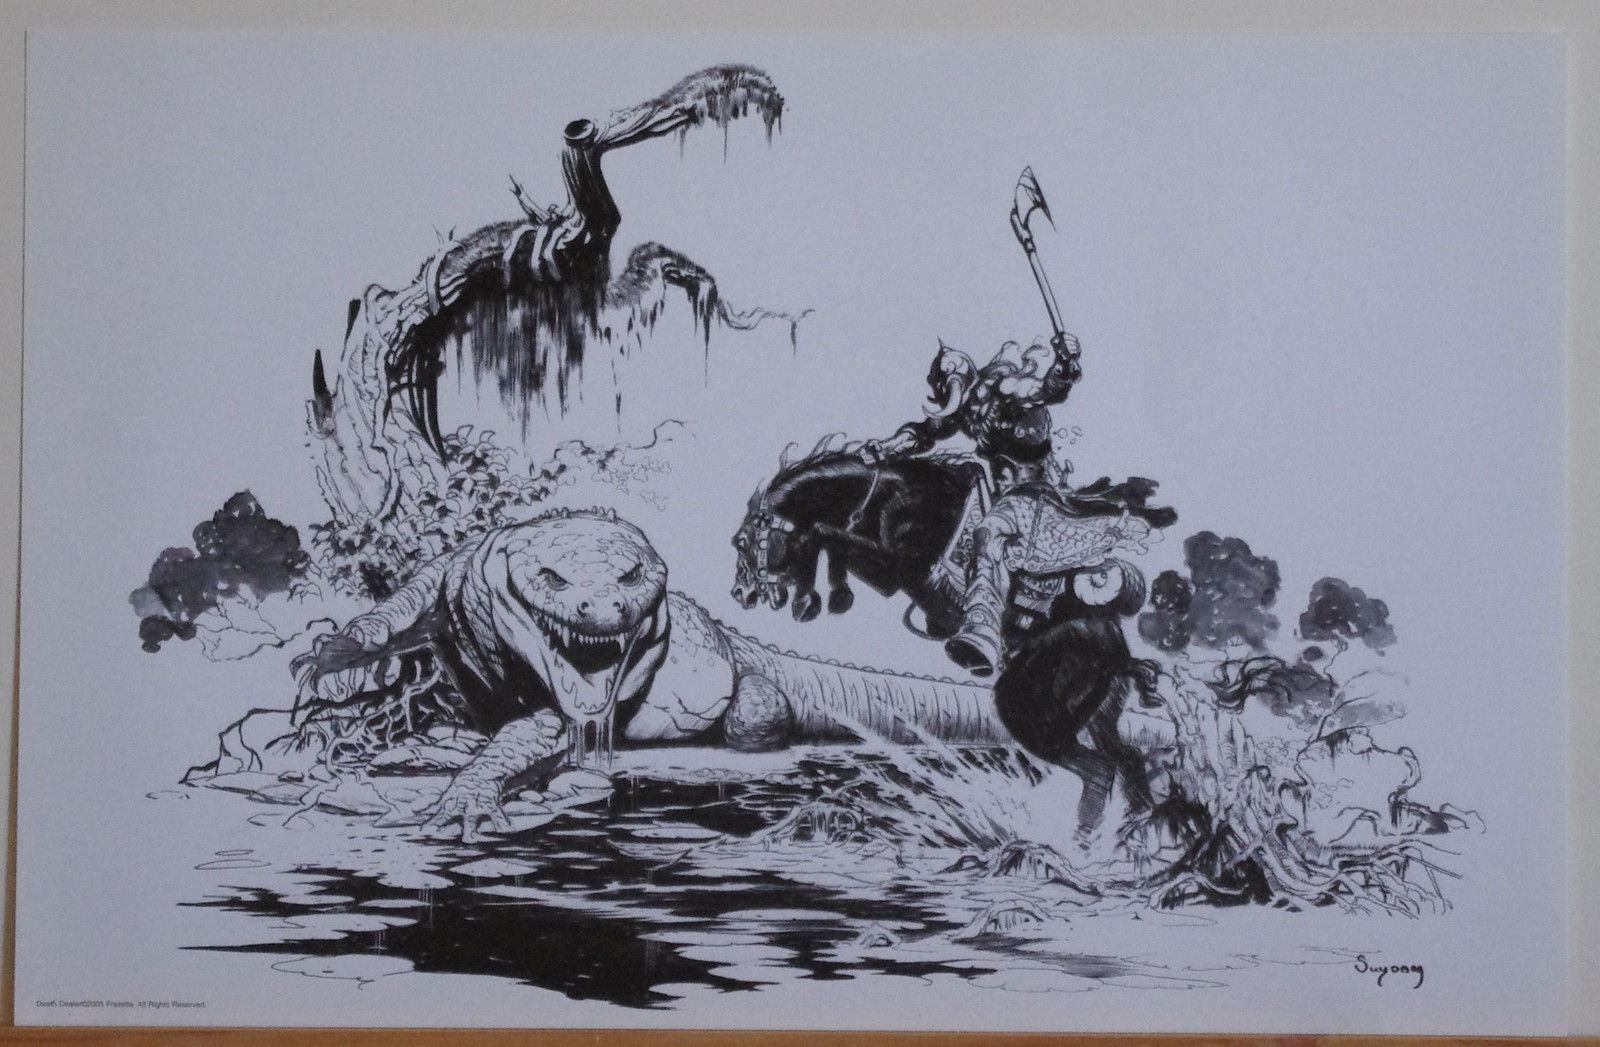 ARTHUR SUYDAM, DEATH DEALER print, VF, Axe, vs Crocodile, Horseback, 11x17, 2005